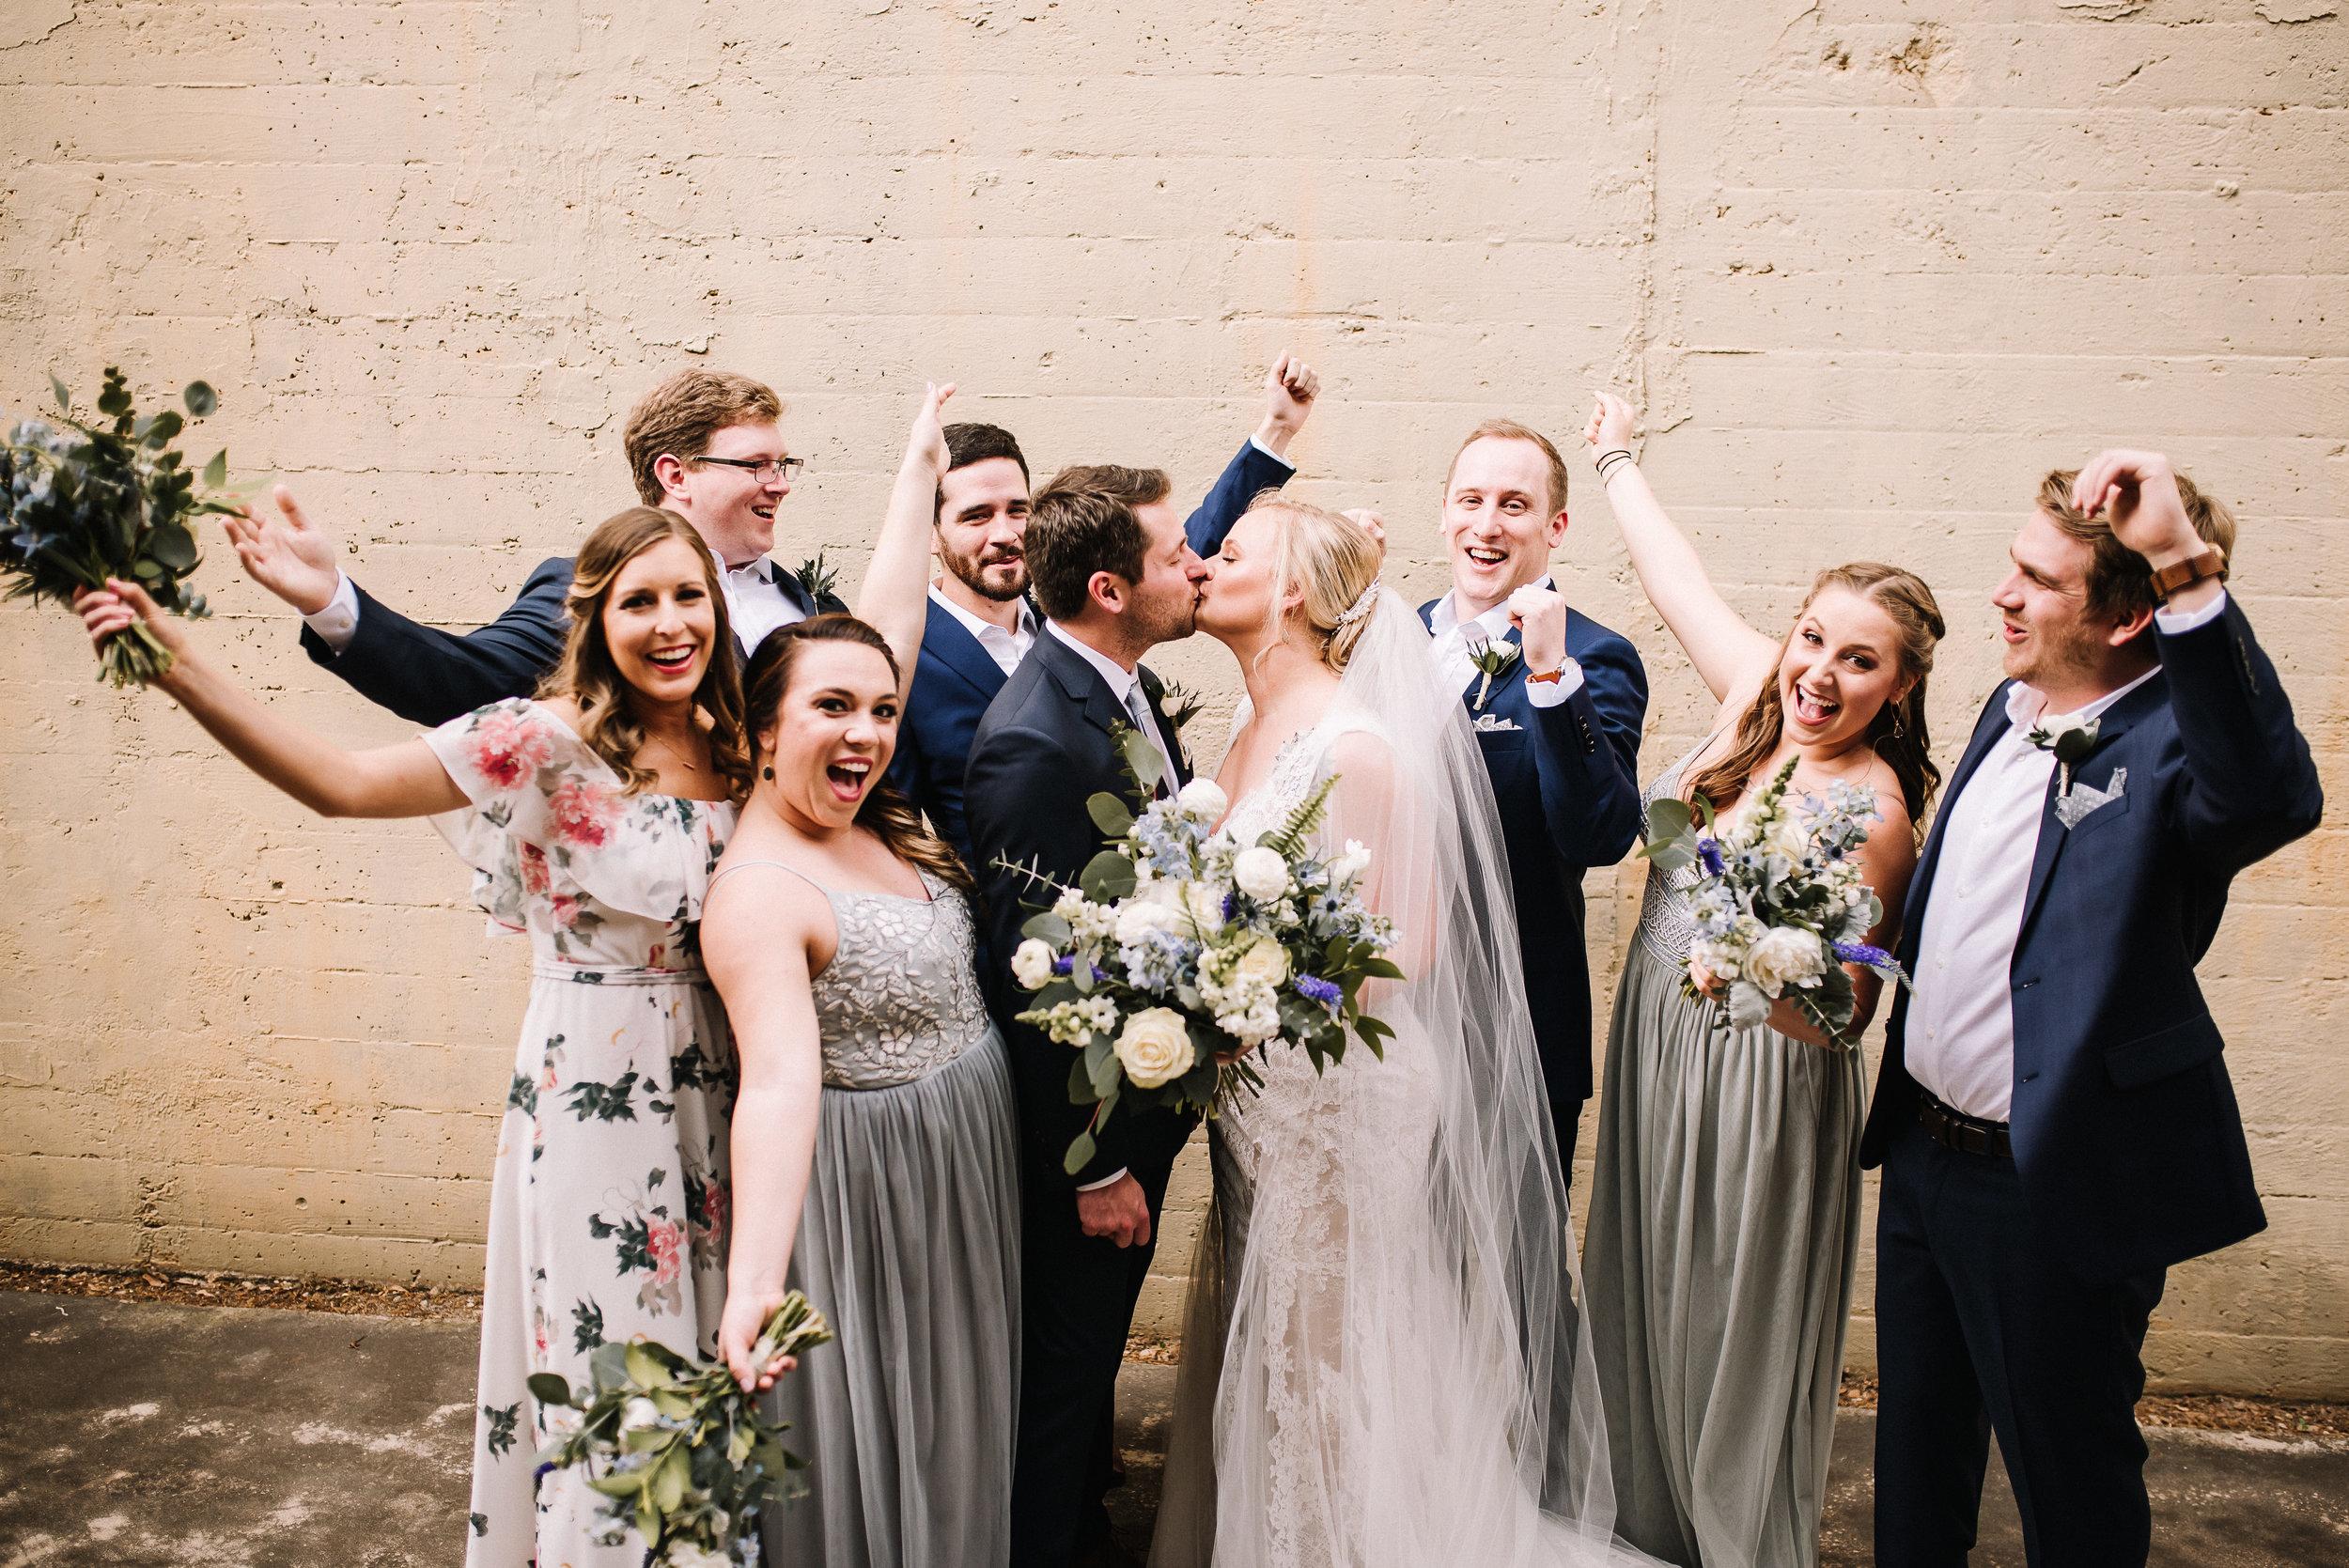 Morgan Wedding_Mill at Yellow River_Ashley Benham Photography-393.jpg